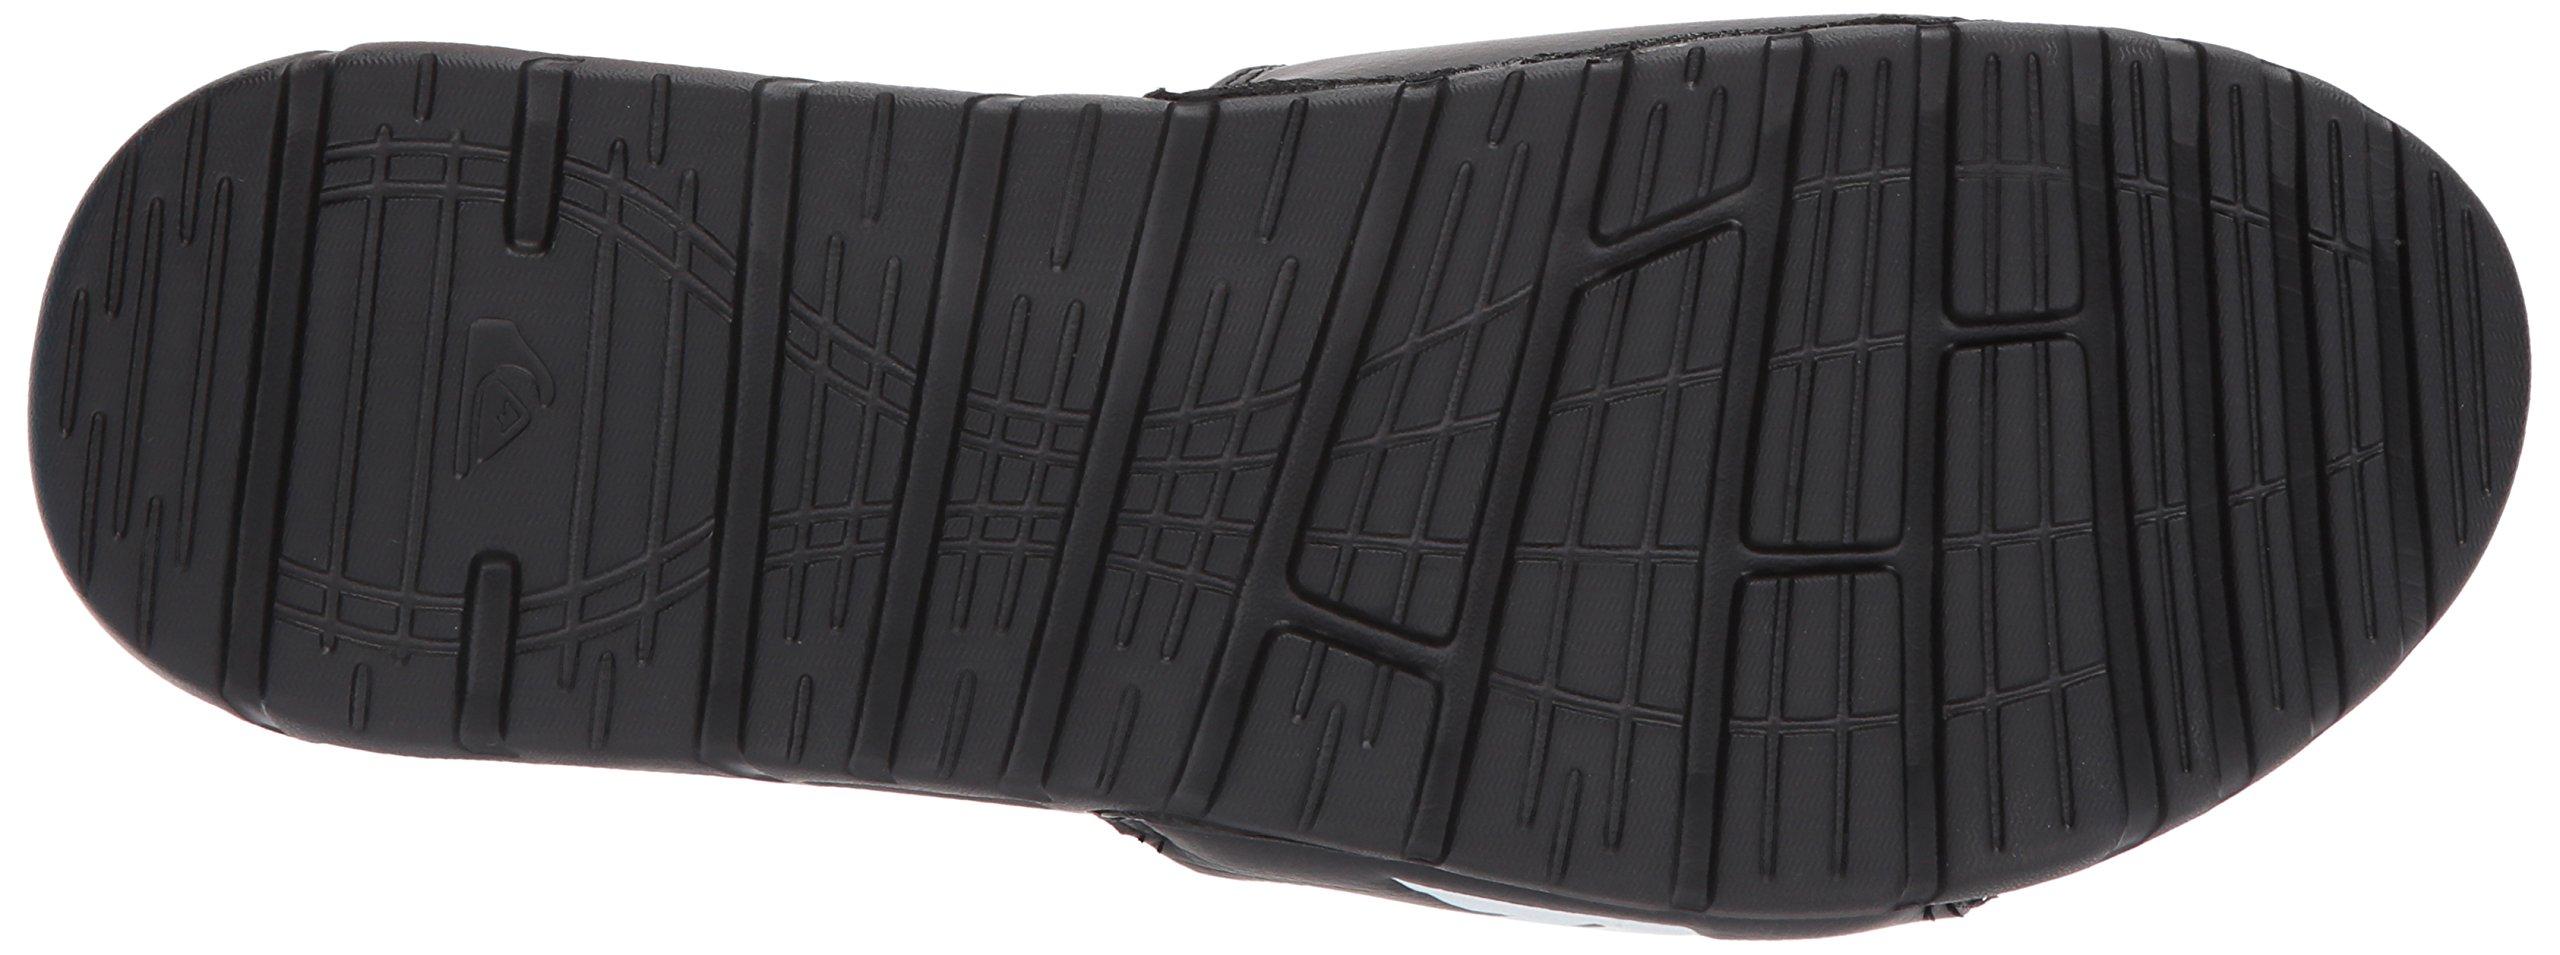 Quiksilver Men's Shoreline Adjust Sandal